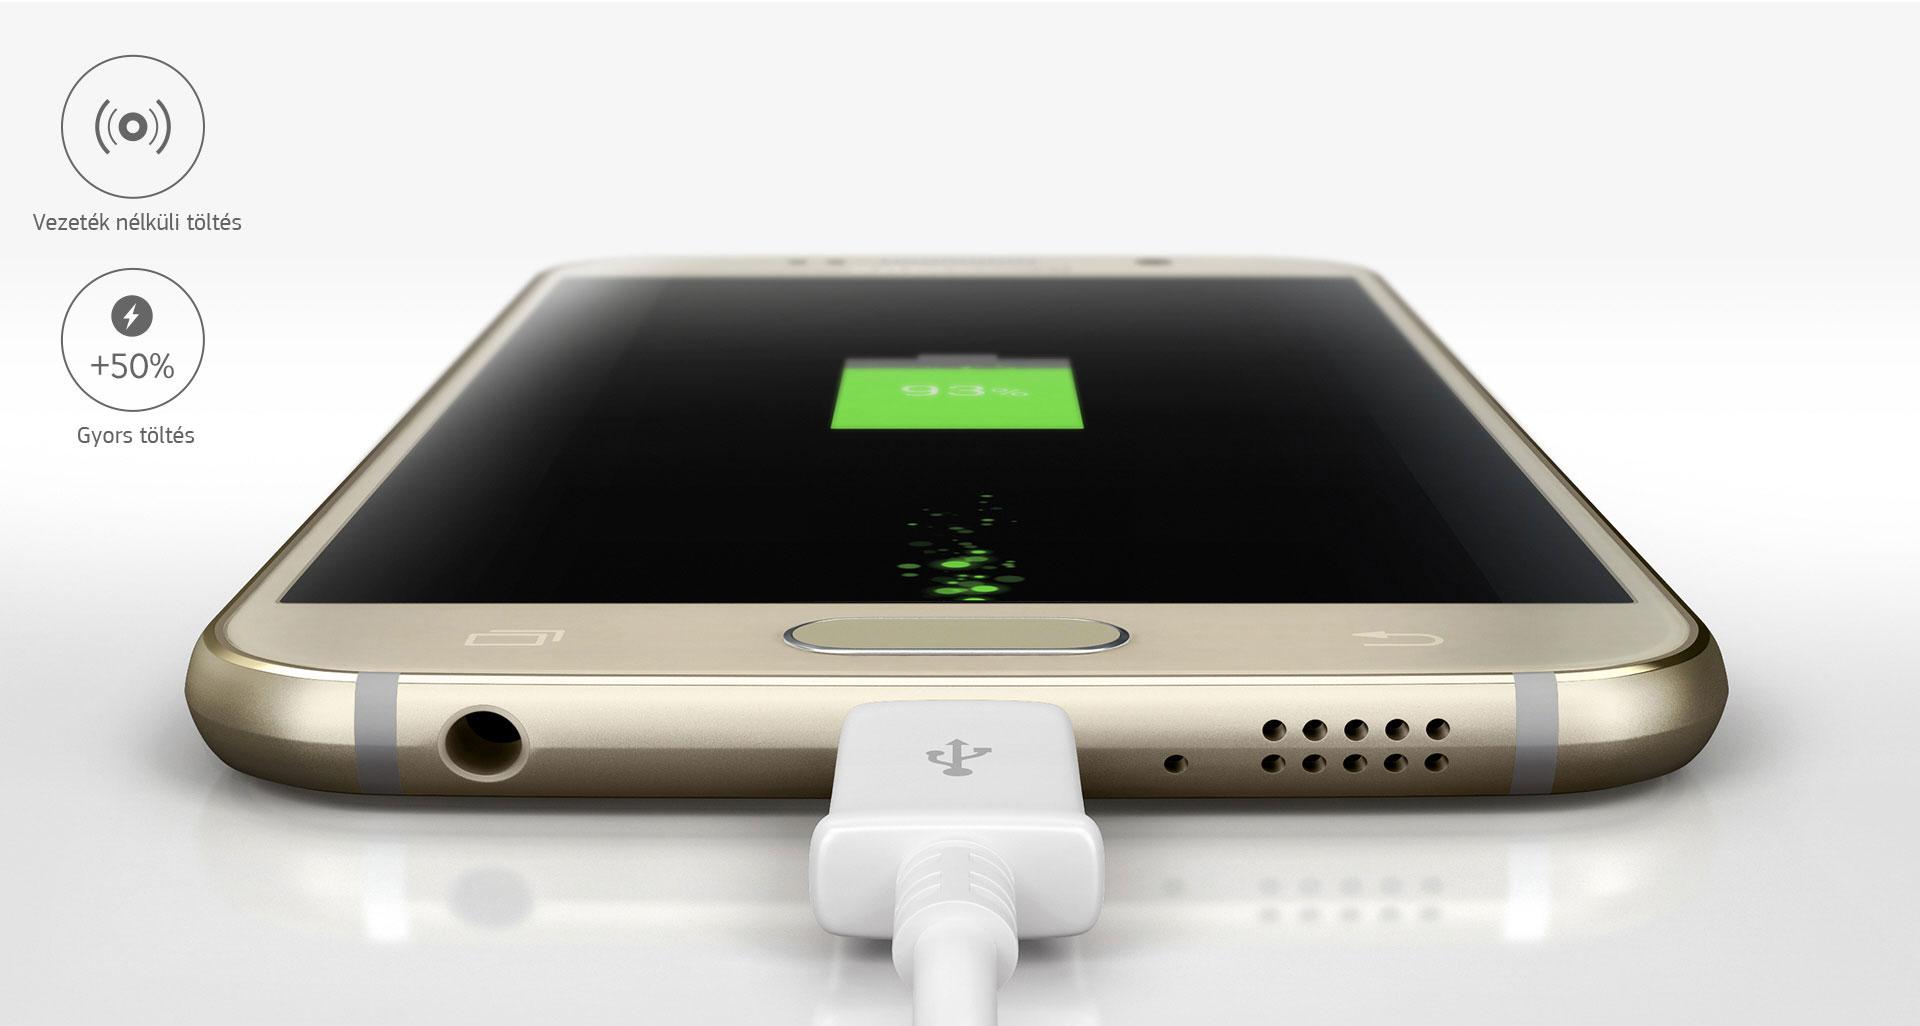 Samsung-Galaxy_S6-edge-mobiltelefon